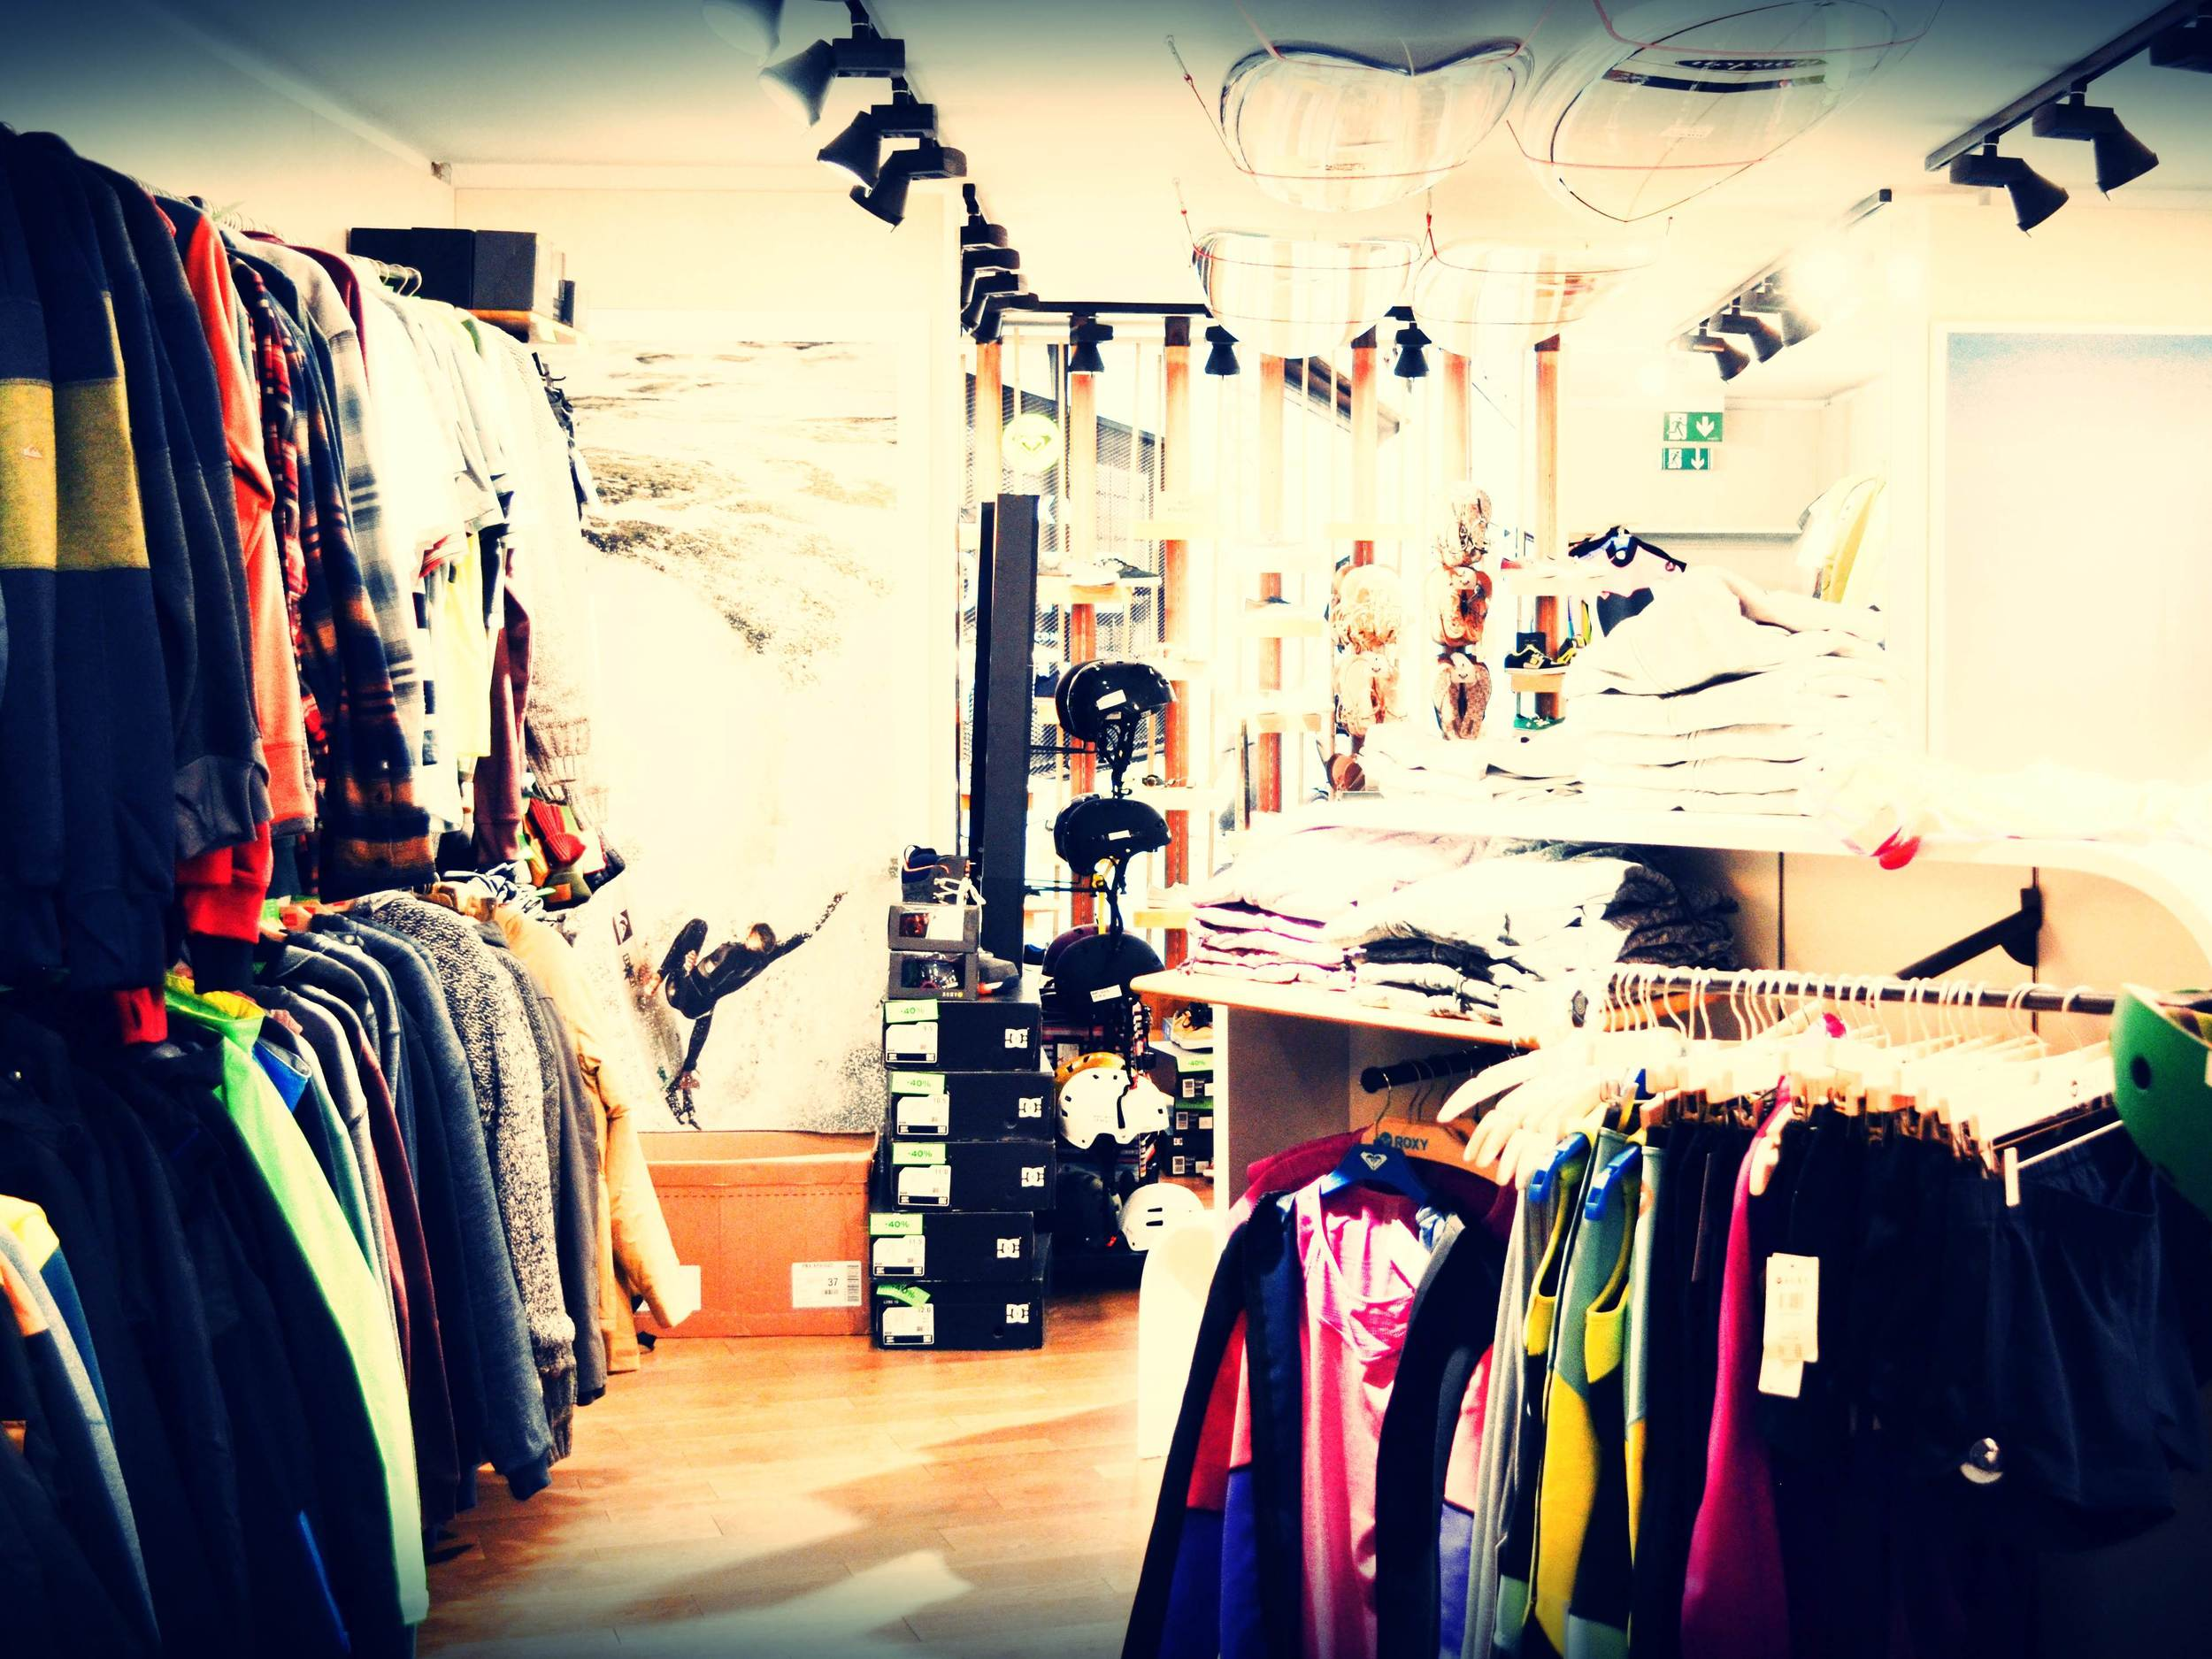 01_Quiksilver-Flensburg-Store-web.JPG